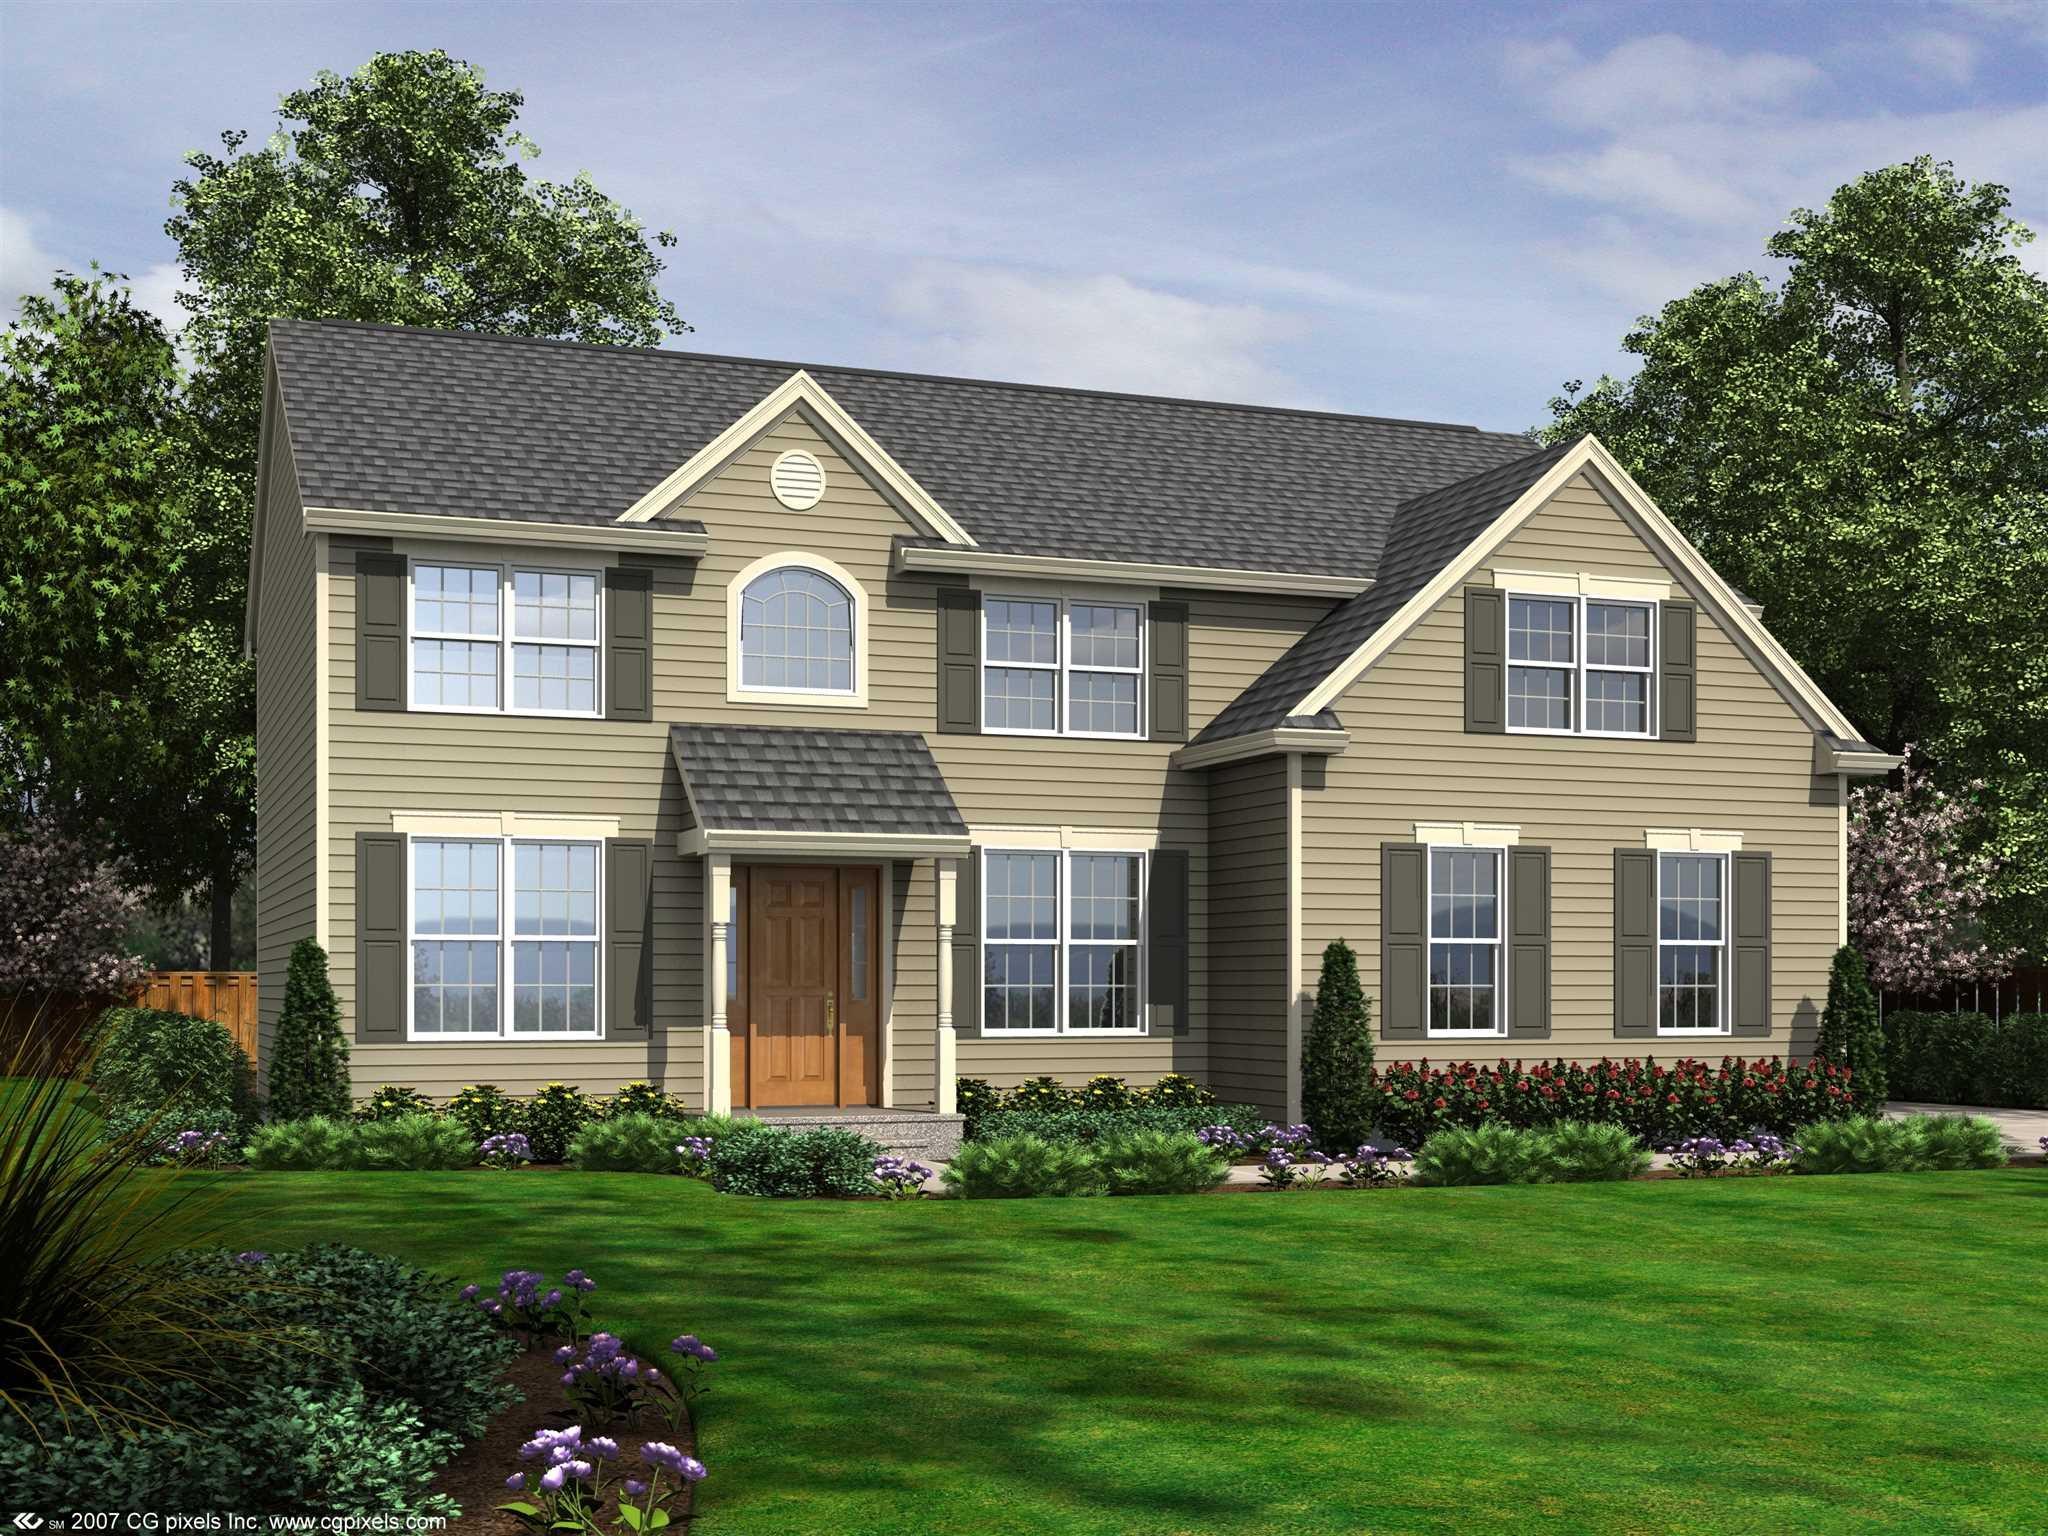 Single Family Home for Sale at 865 LATTINTOWN Road 865 LATTINTOWN Road Marlborough, New York 12547 United States